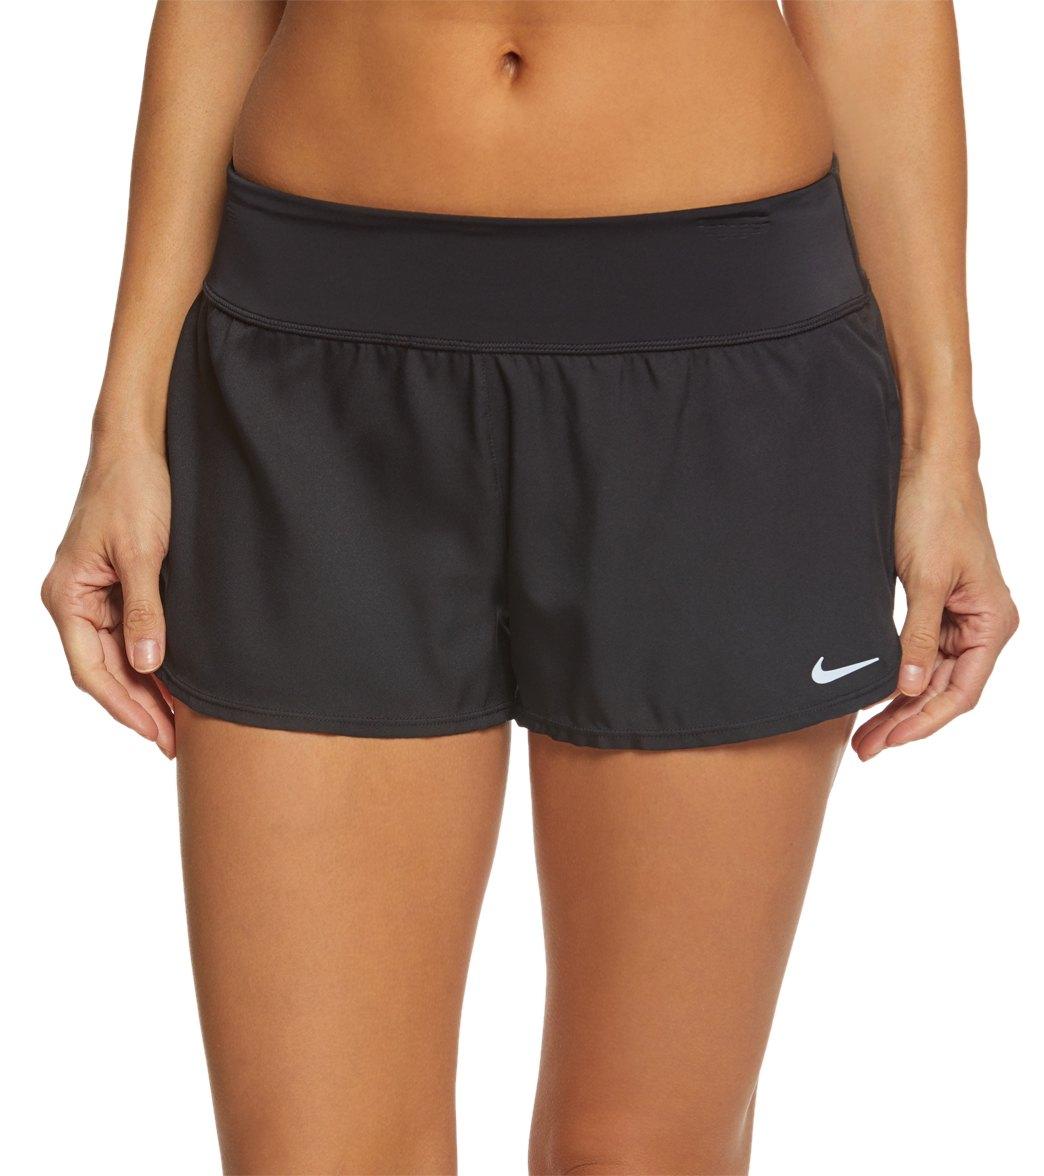 f2c9951e6d0d ... Nike Women s Element Boardshort. Play Video. MODEL MEASUREMENTS